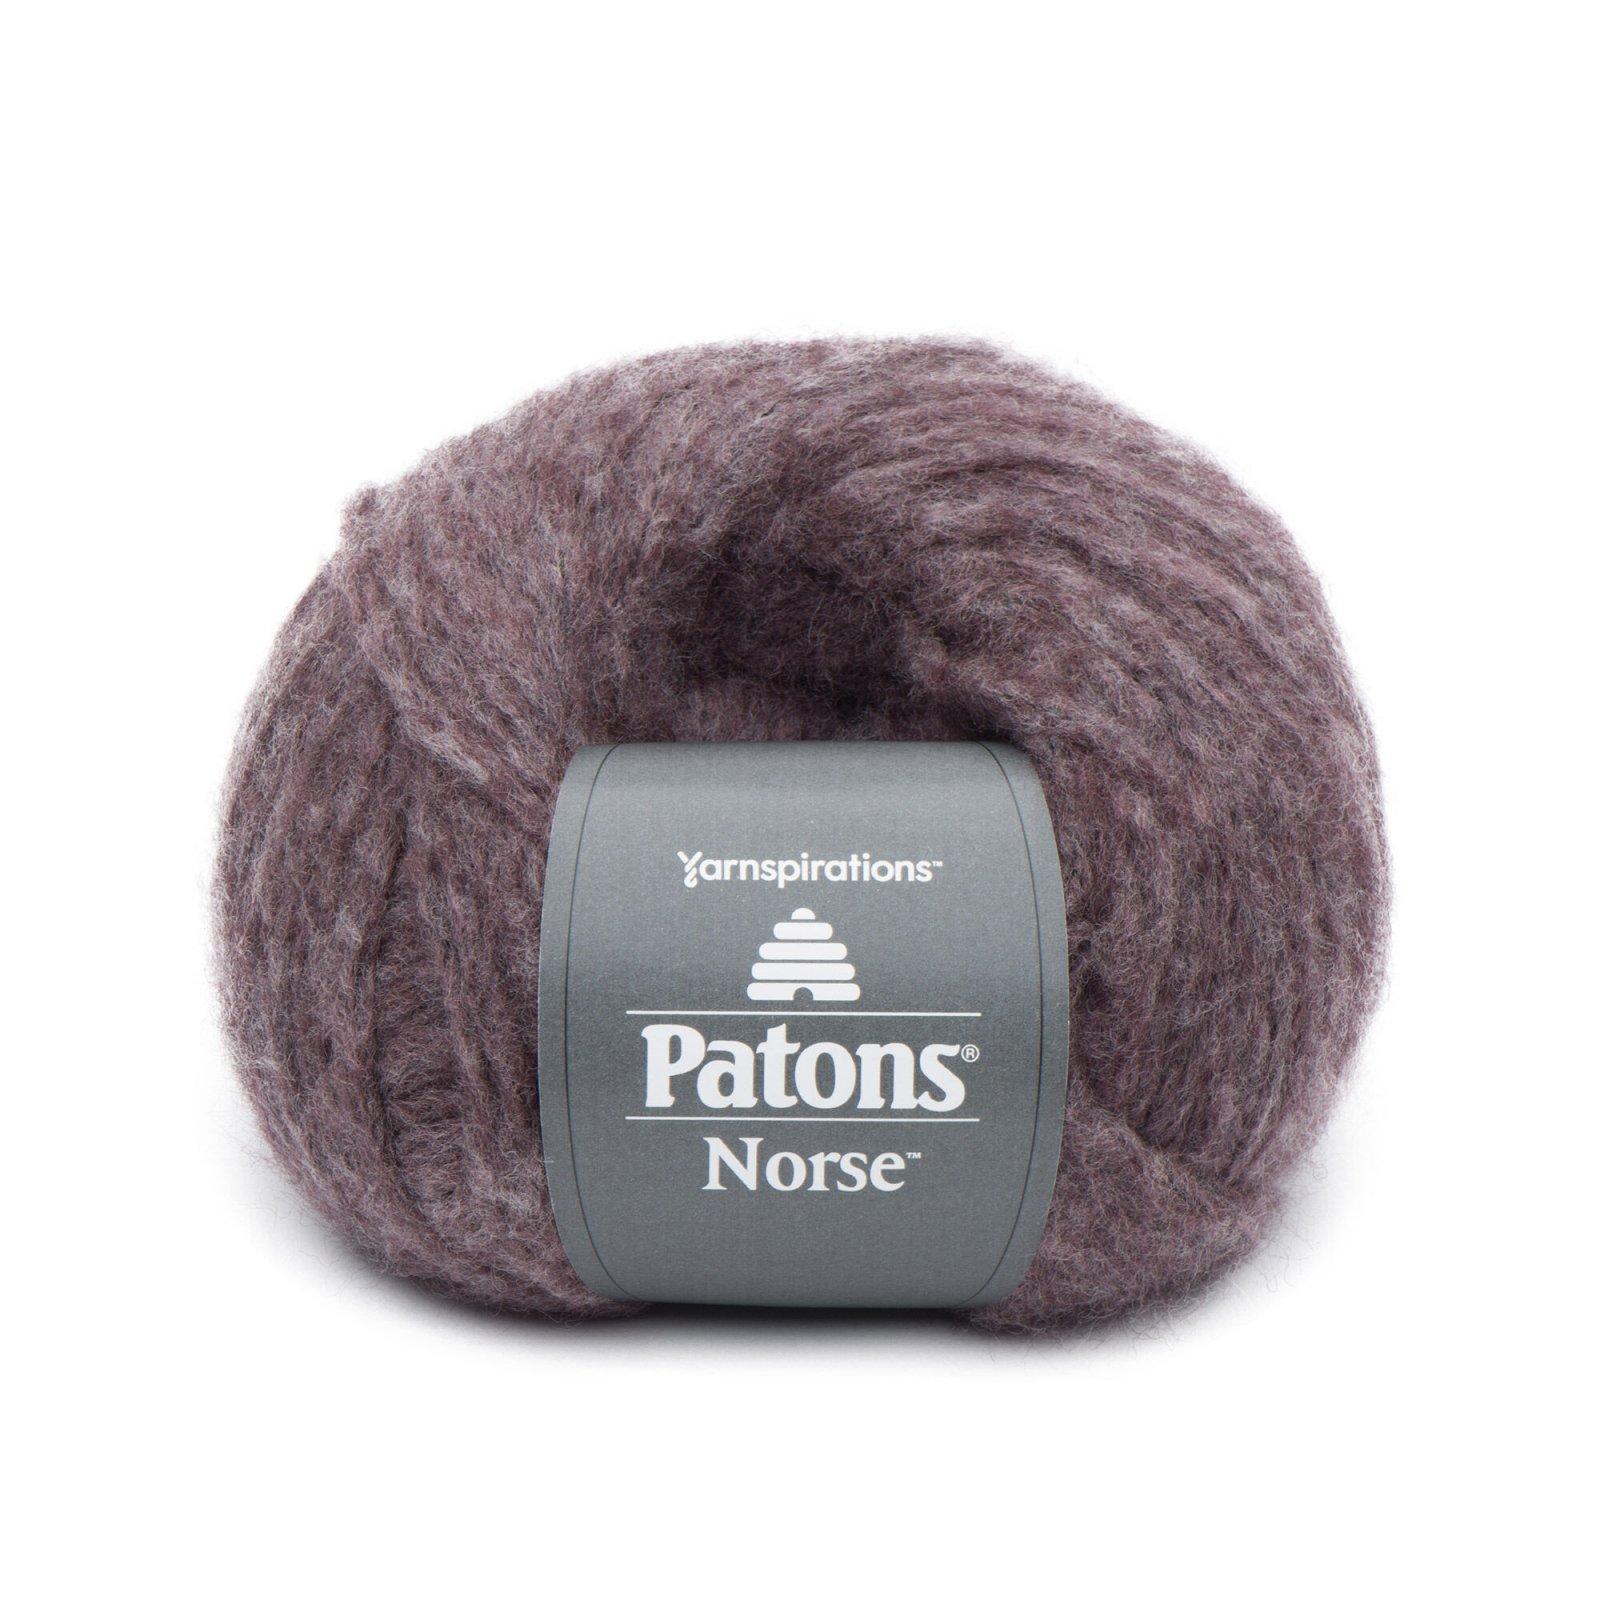 Patons Norse Yarn - Burgundy 91007